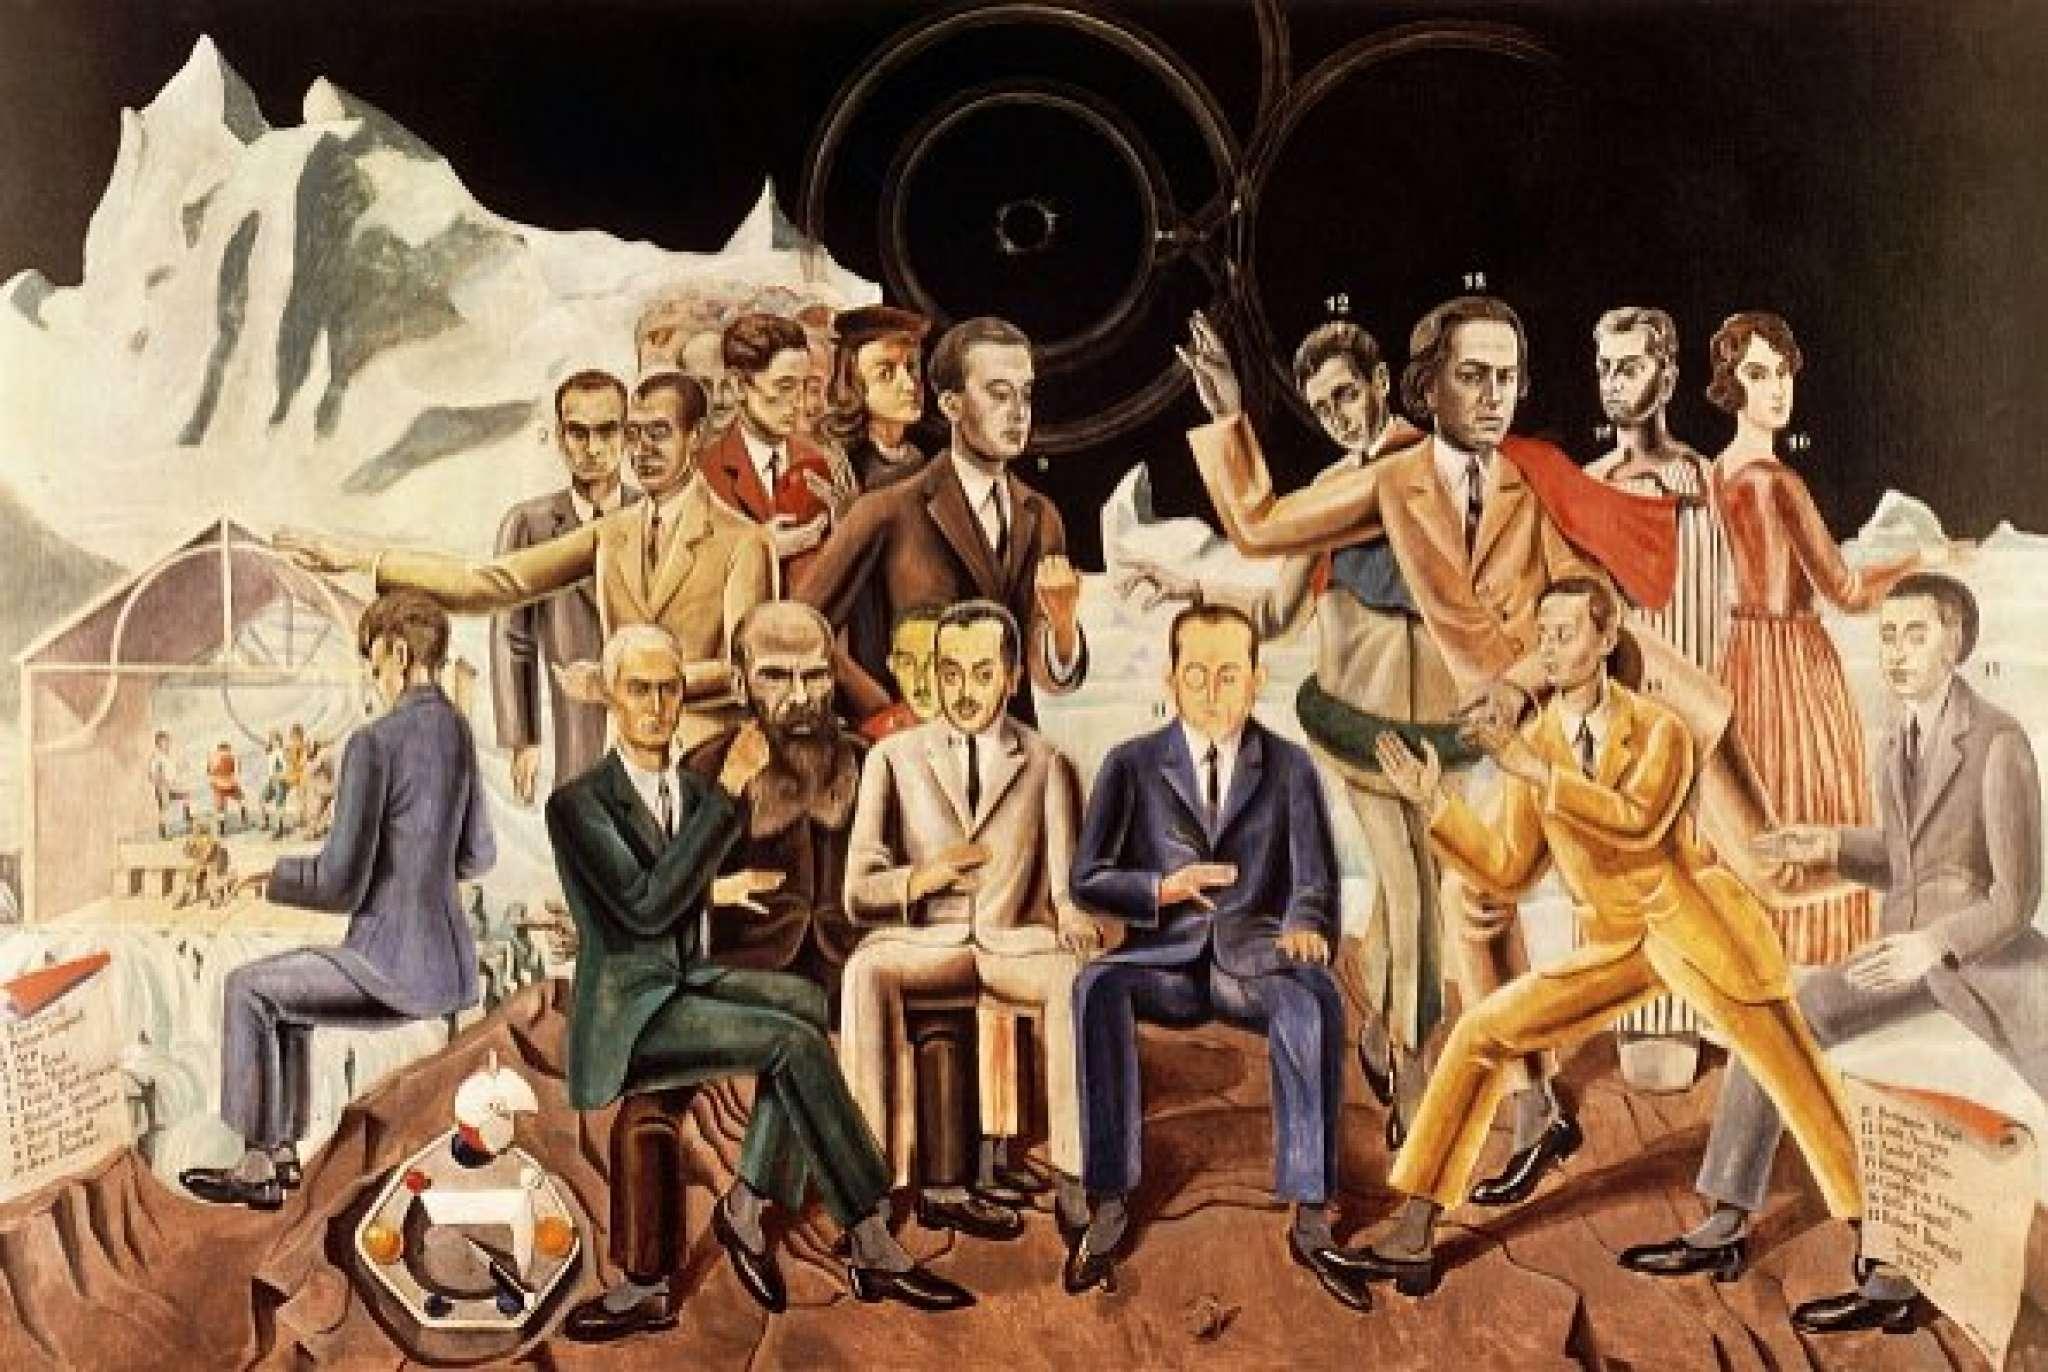 """Happy 100th, Dada: SF celebrates influential art movement"""